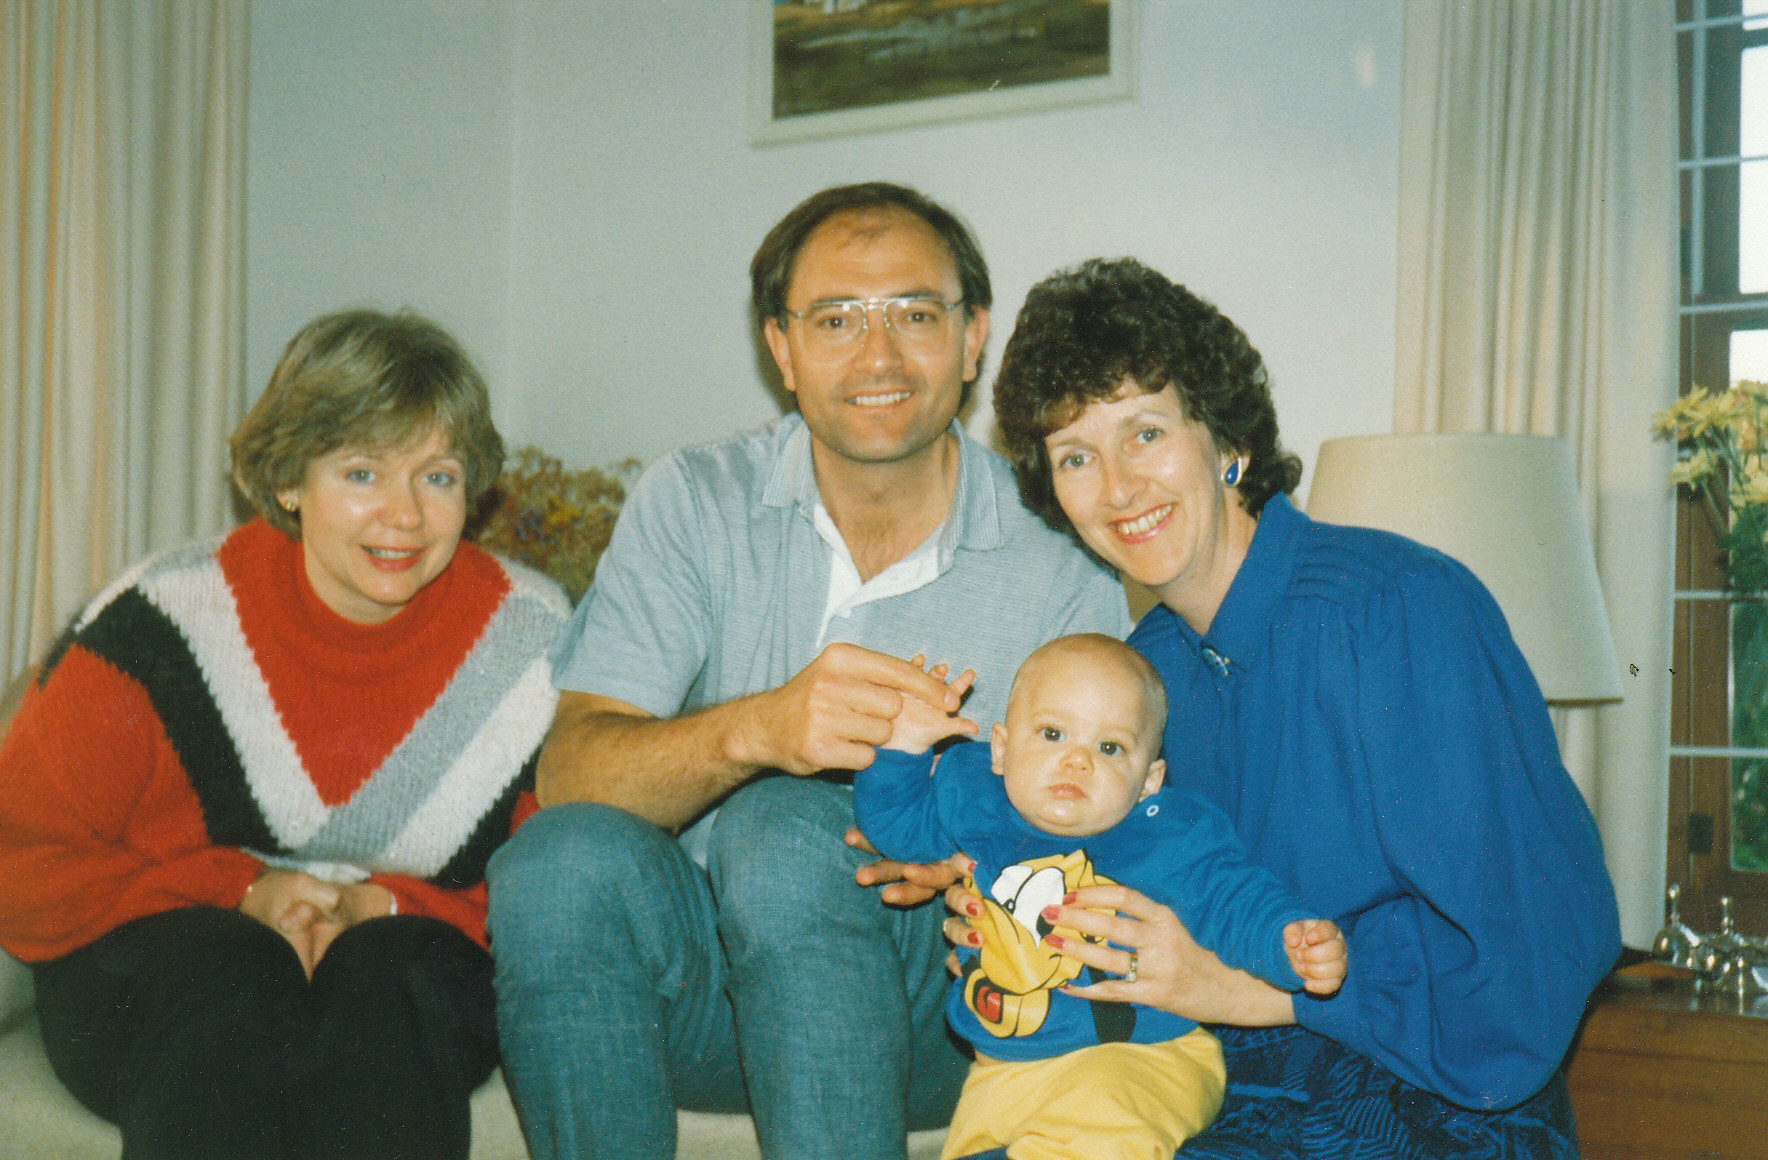 Relatives0017 -